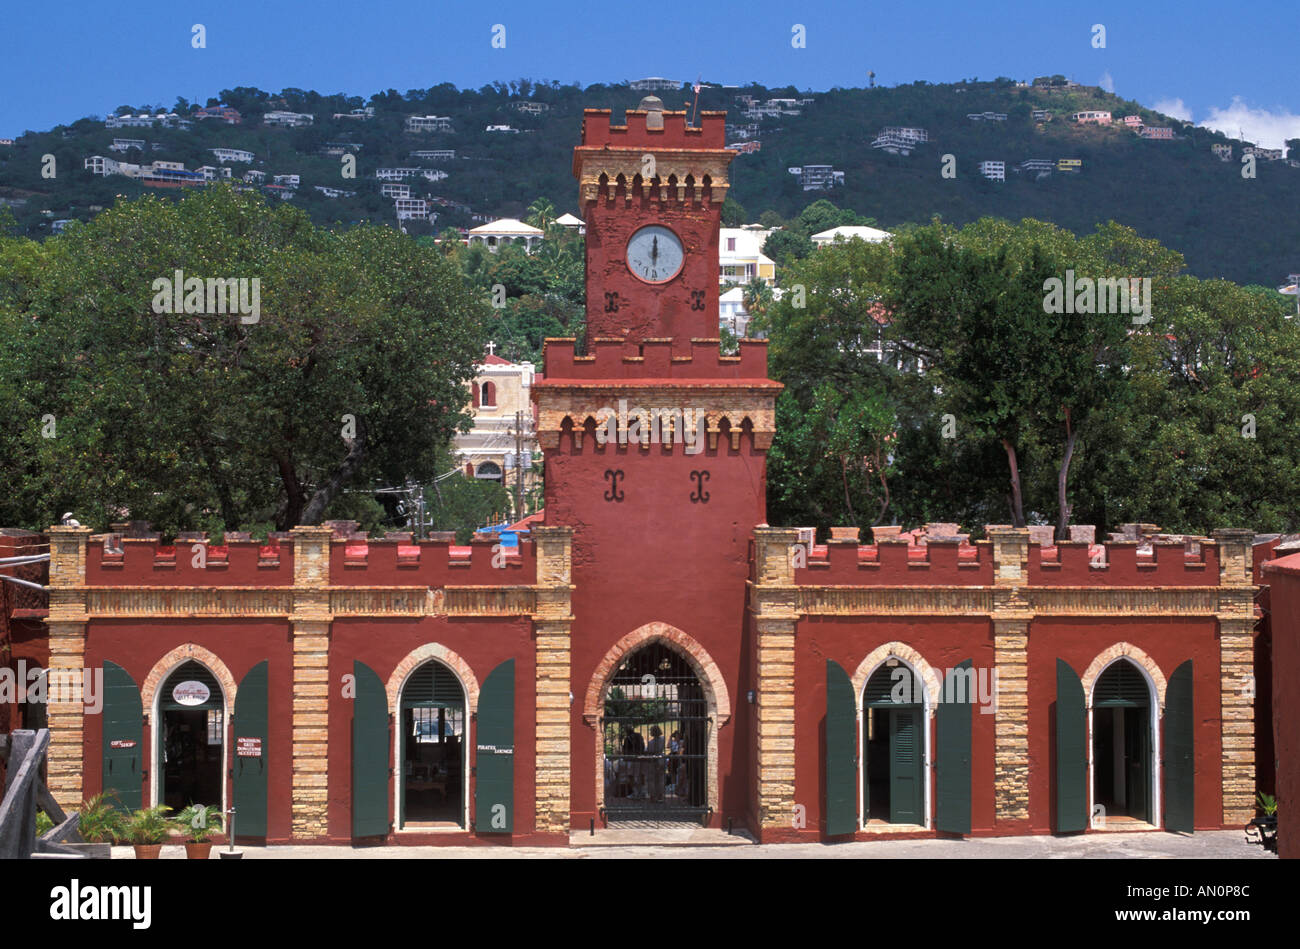 Fort Christian museum St Thomas historic landmark US Virgin Islands Charlotte Amalie bright red walls landmark attraction - Stock Image